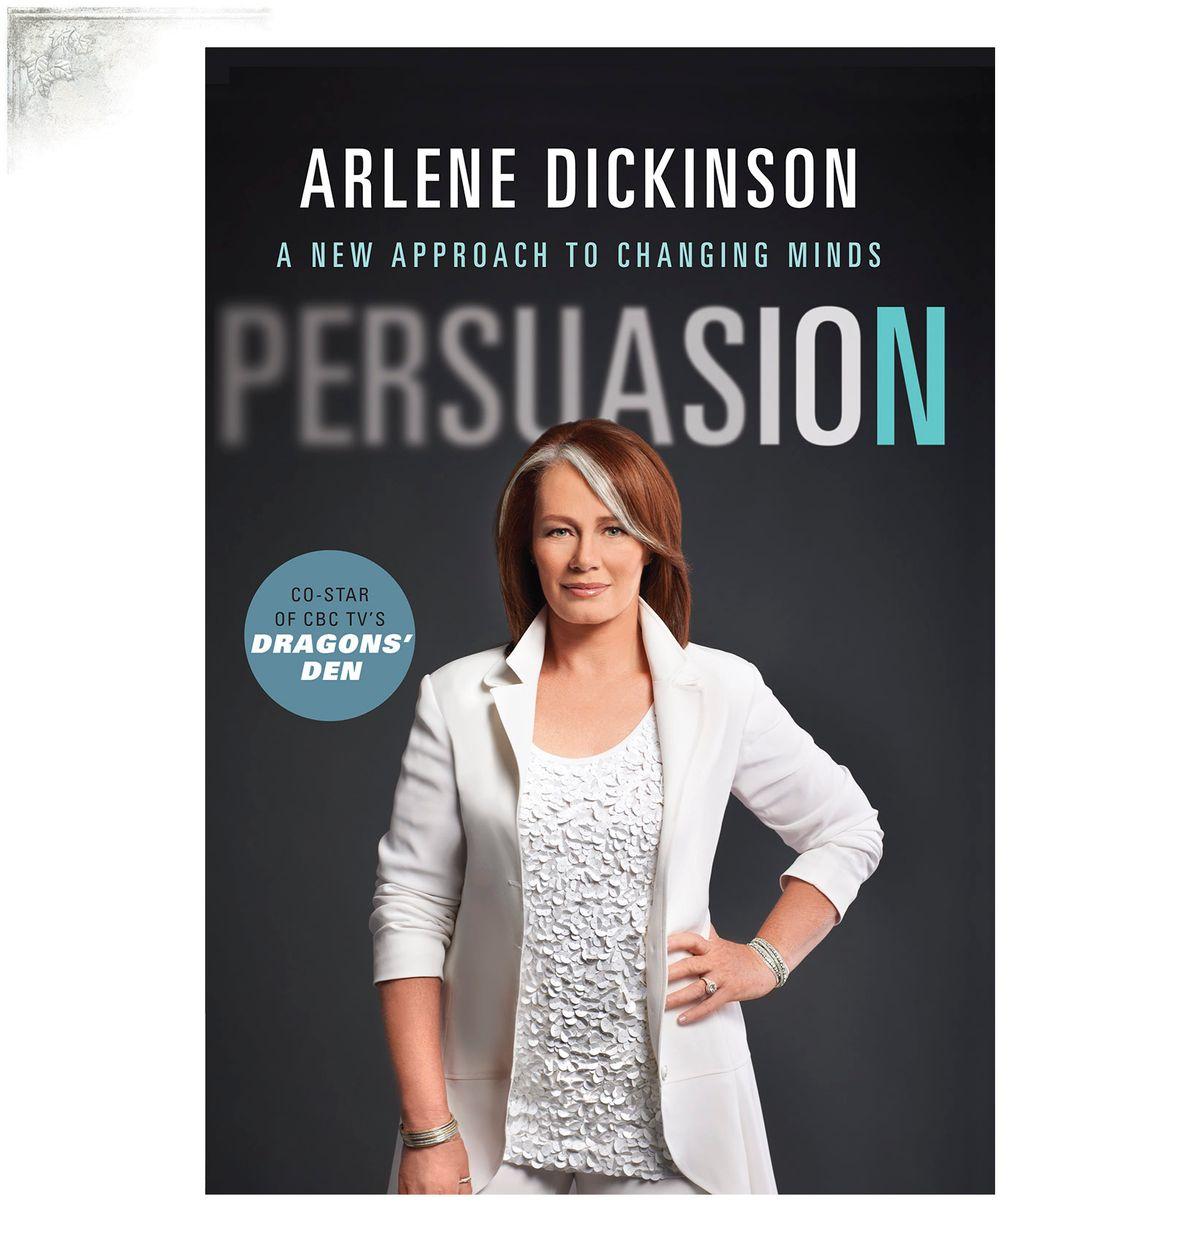 PersuasionPortfPage.jpg